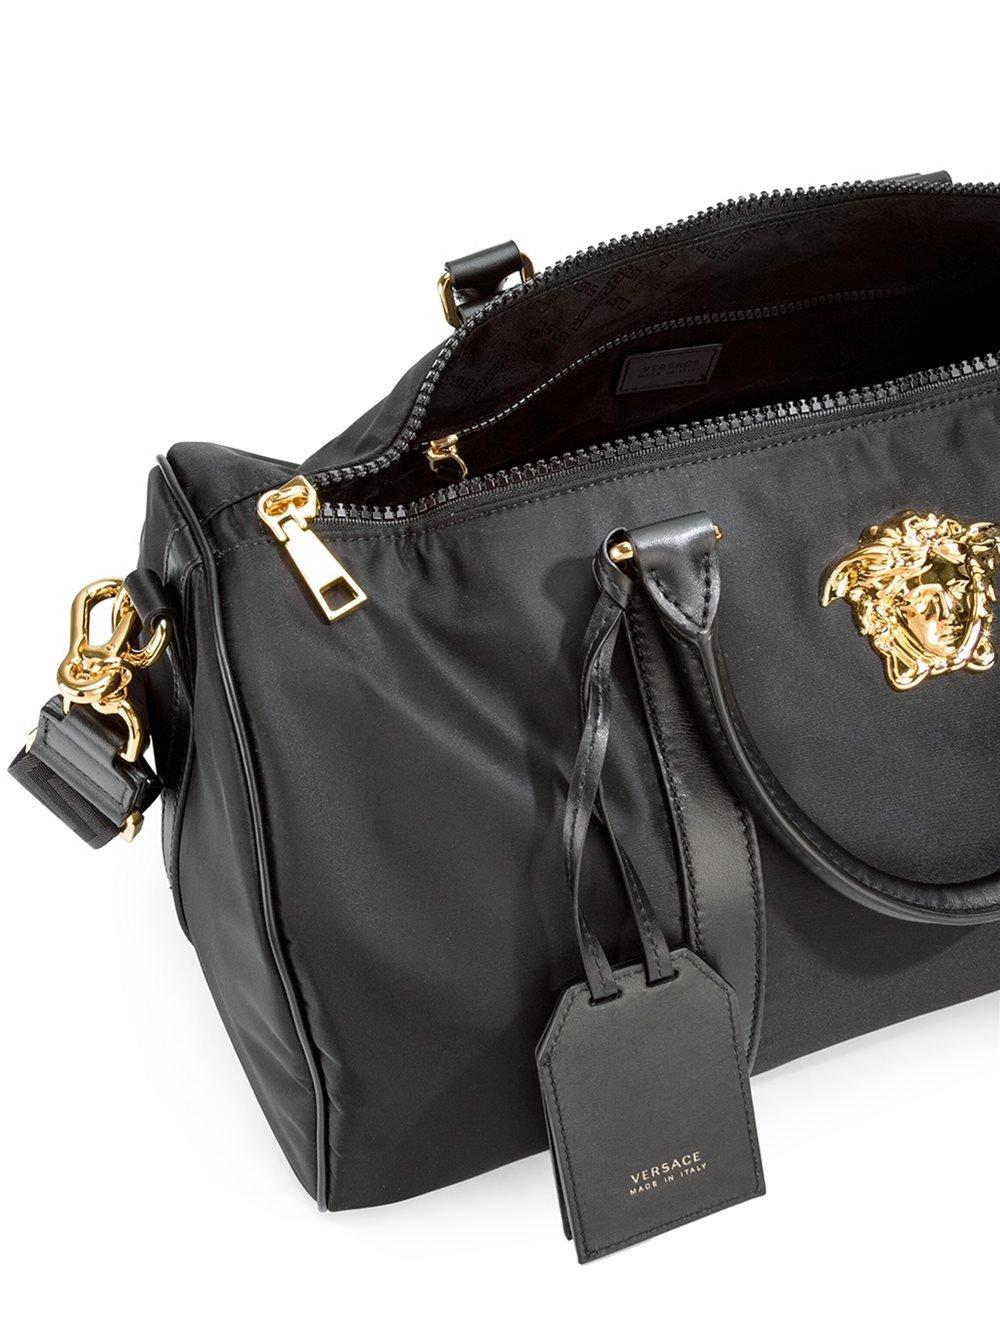 99da56756 Versace 'palazzo Medusa' Duffle Bag in Black for Men - Lyst